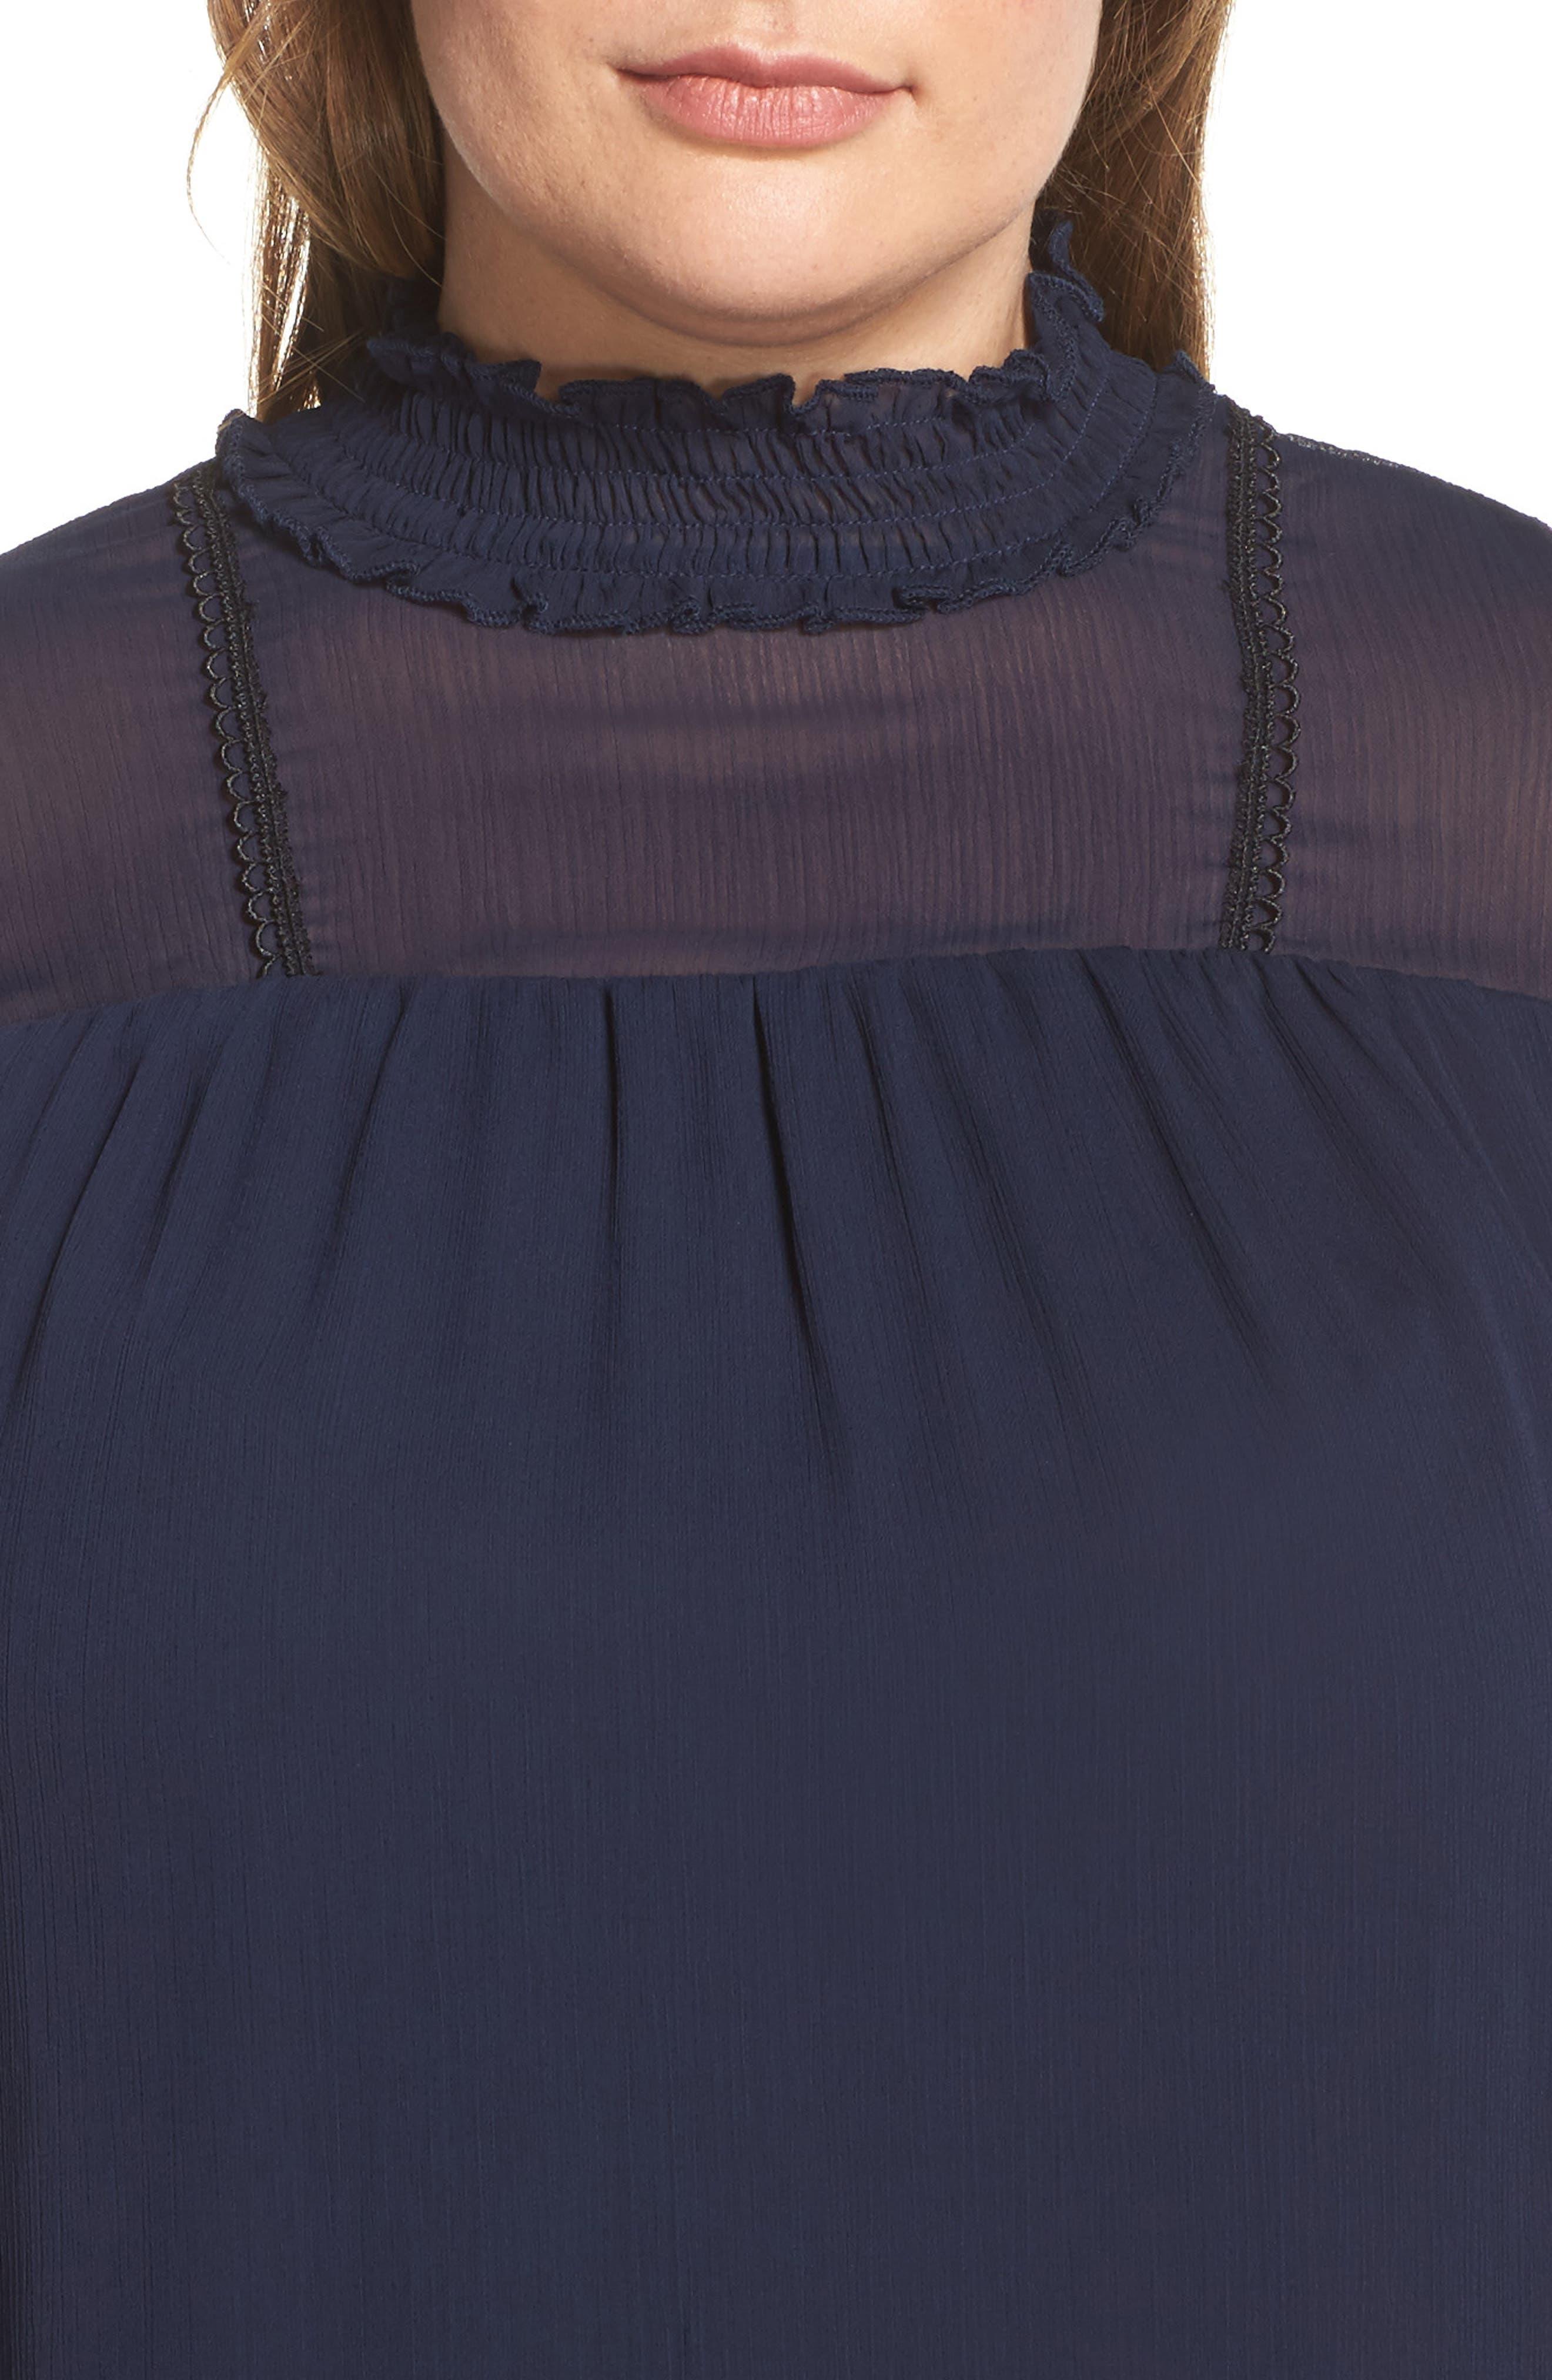 Lace Trim Babydoll Top,                             Alternate thumbnail 4, color,                             401